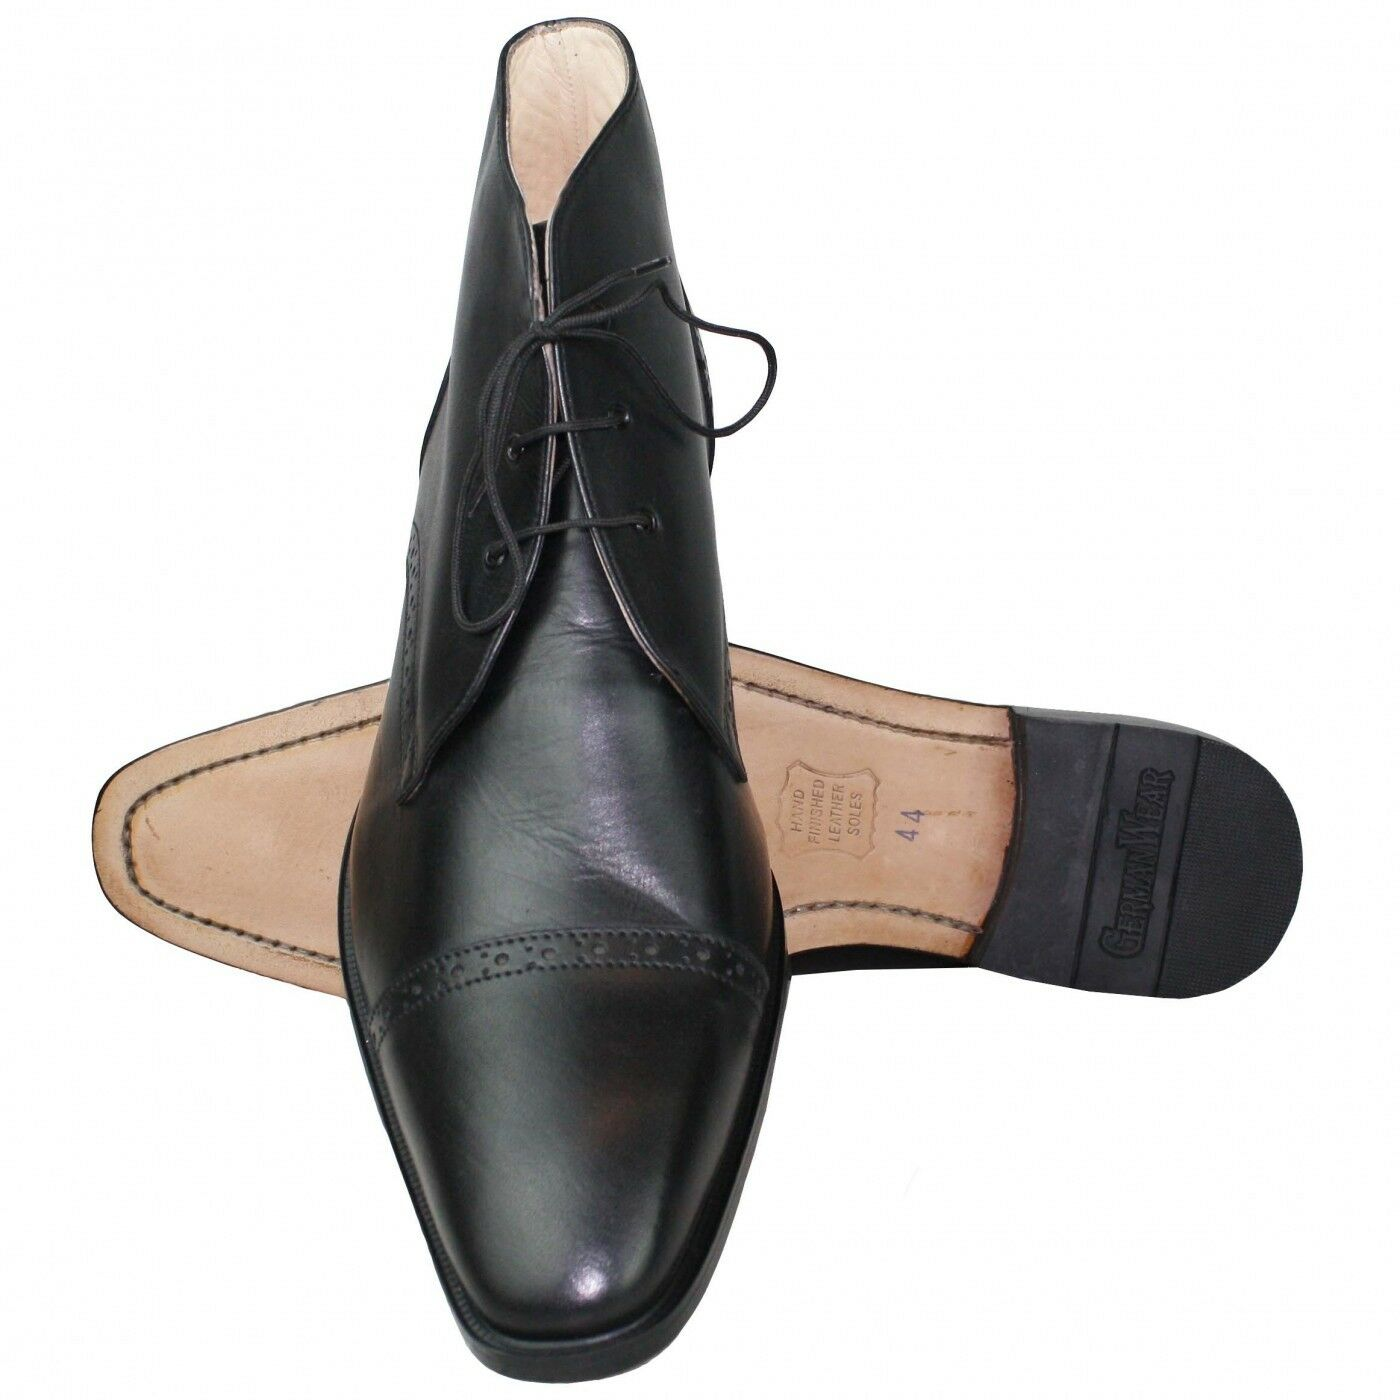 Business Stiefeletten Lederschuhe mit Ledersohle Schuhe schwarz